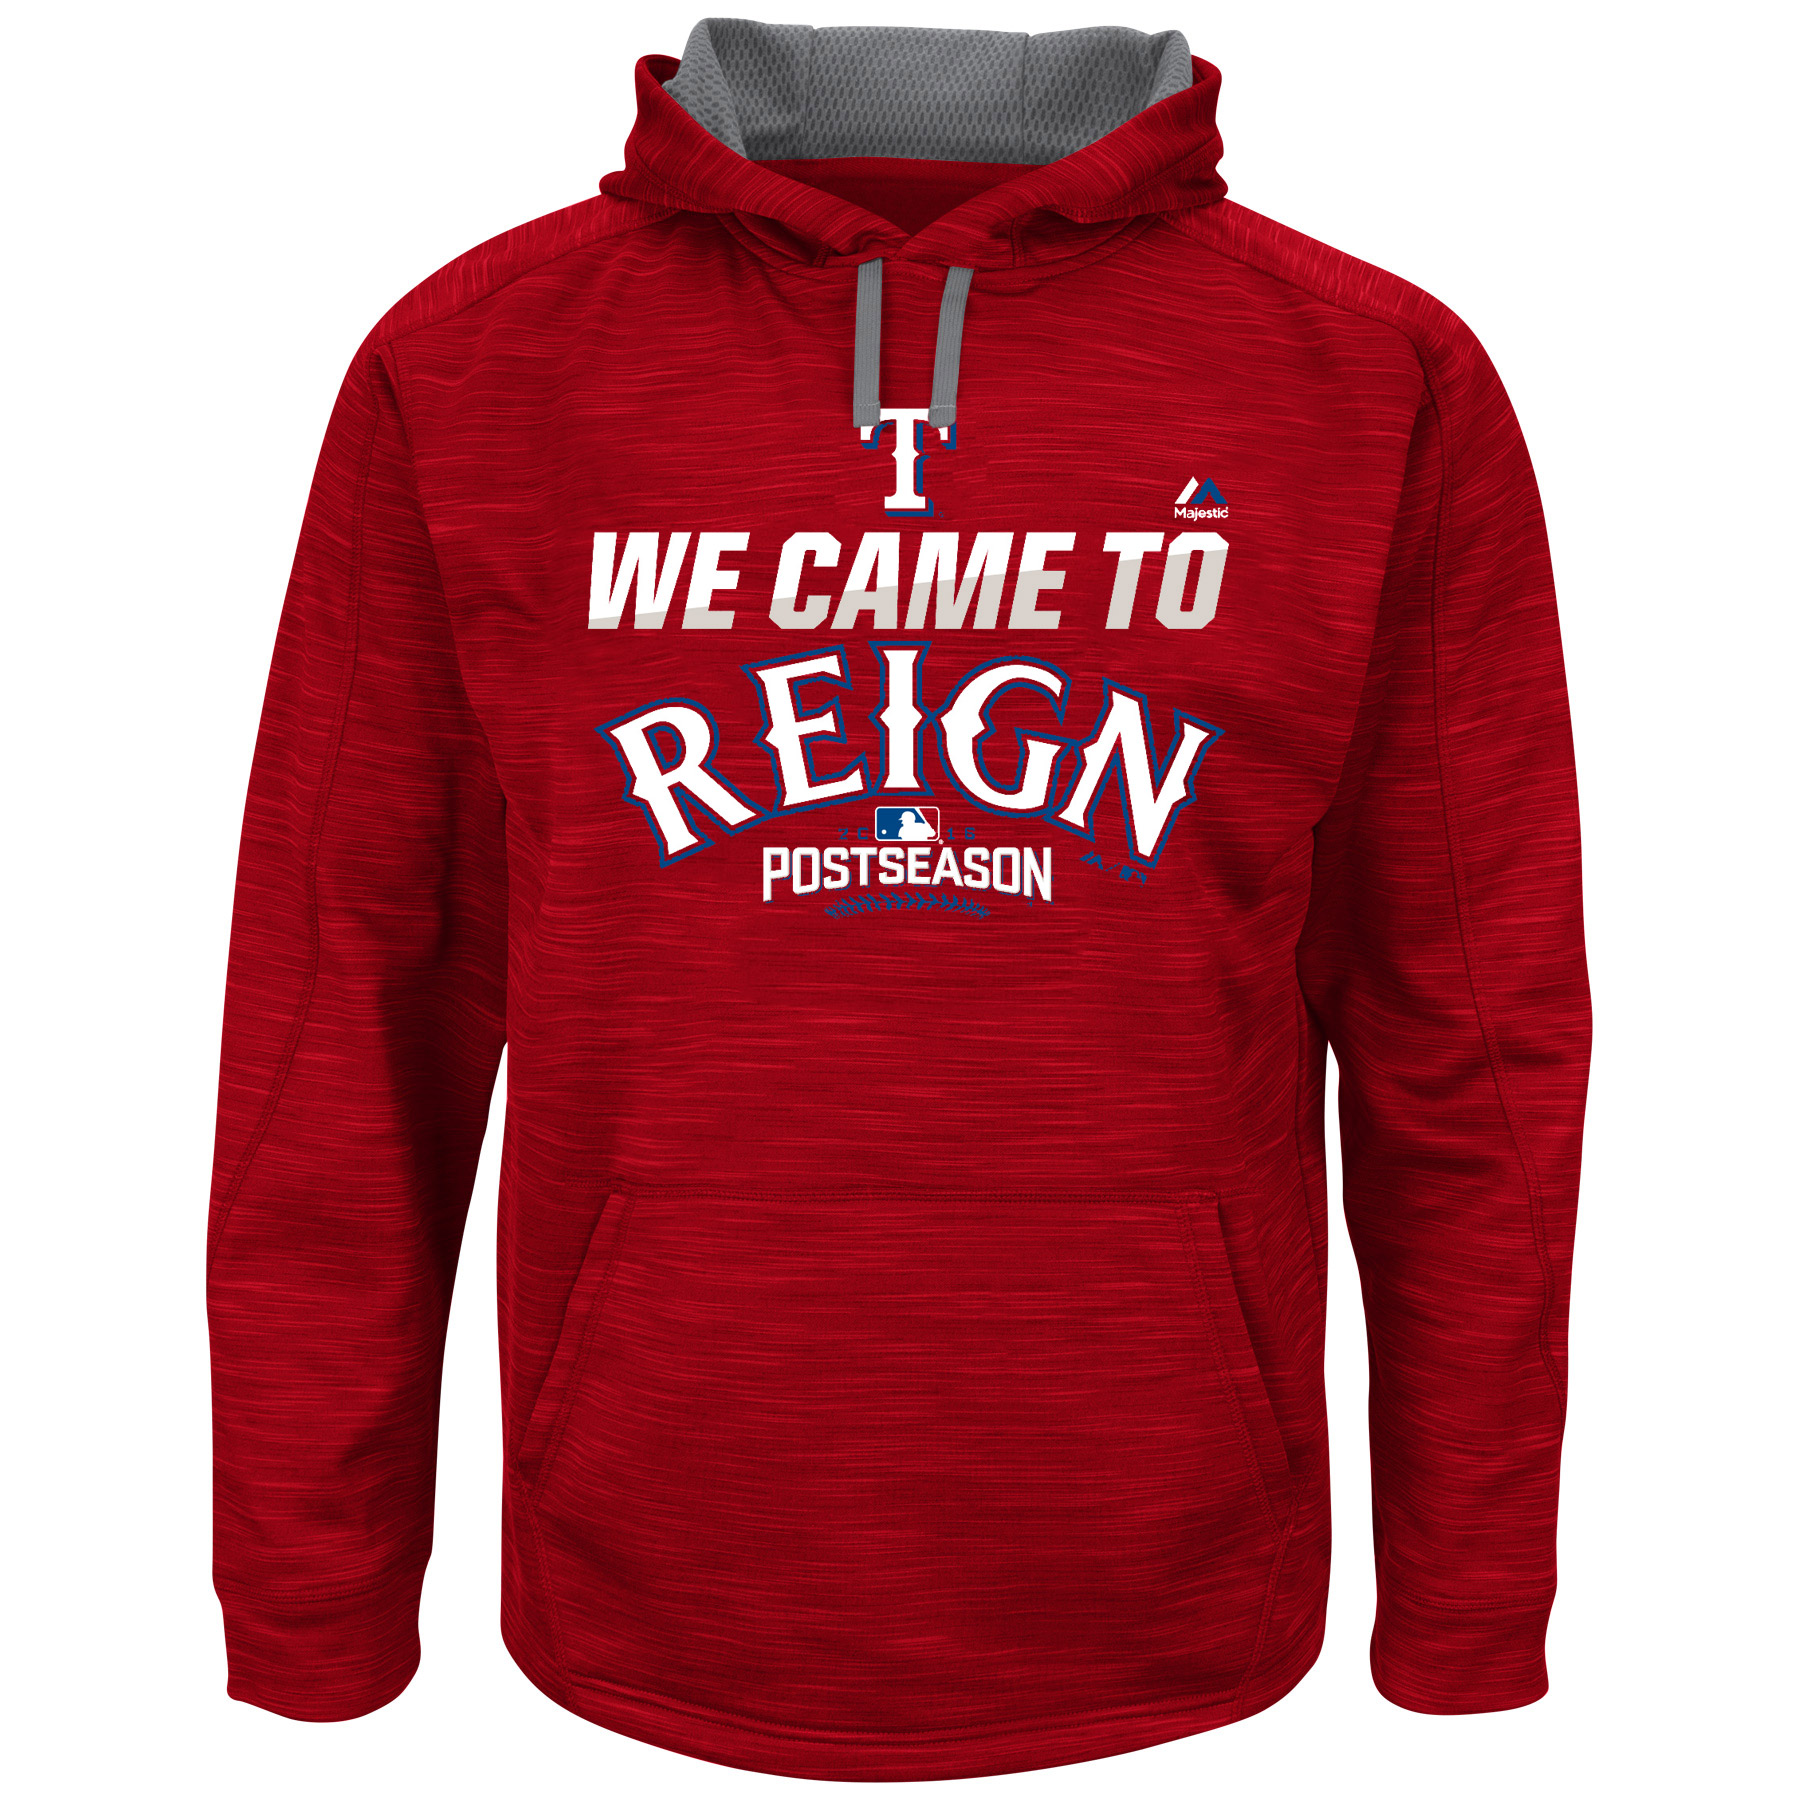 Texas Rangers Majestic 2016 Postseason We Came To Reign Streak Big & Tall Fleece Hoodie - Red